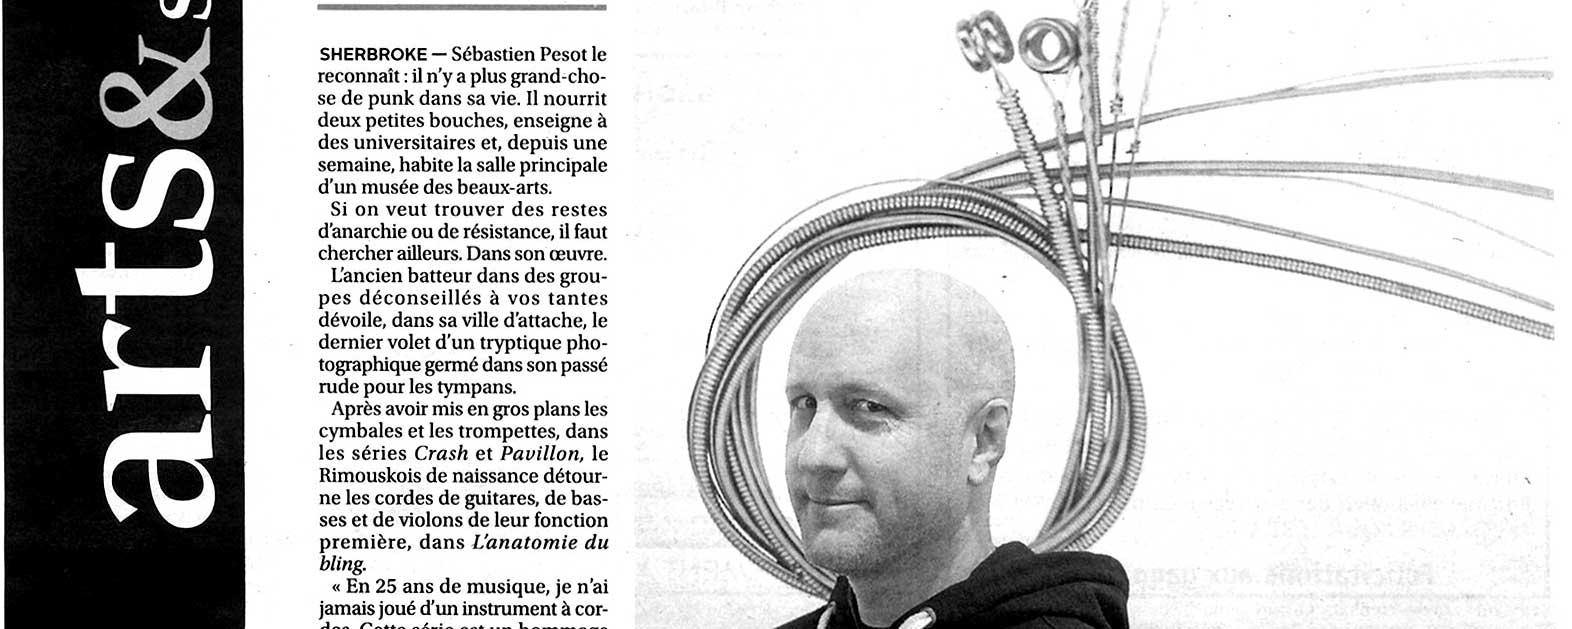 La Tribune: Cordes sensibles